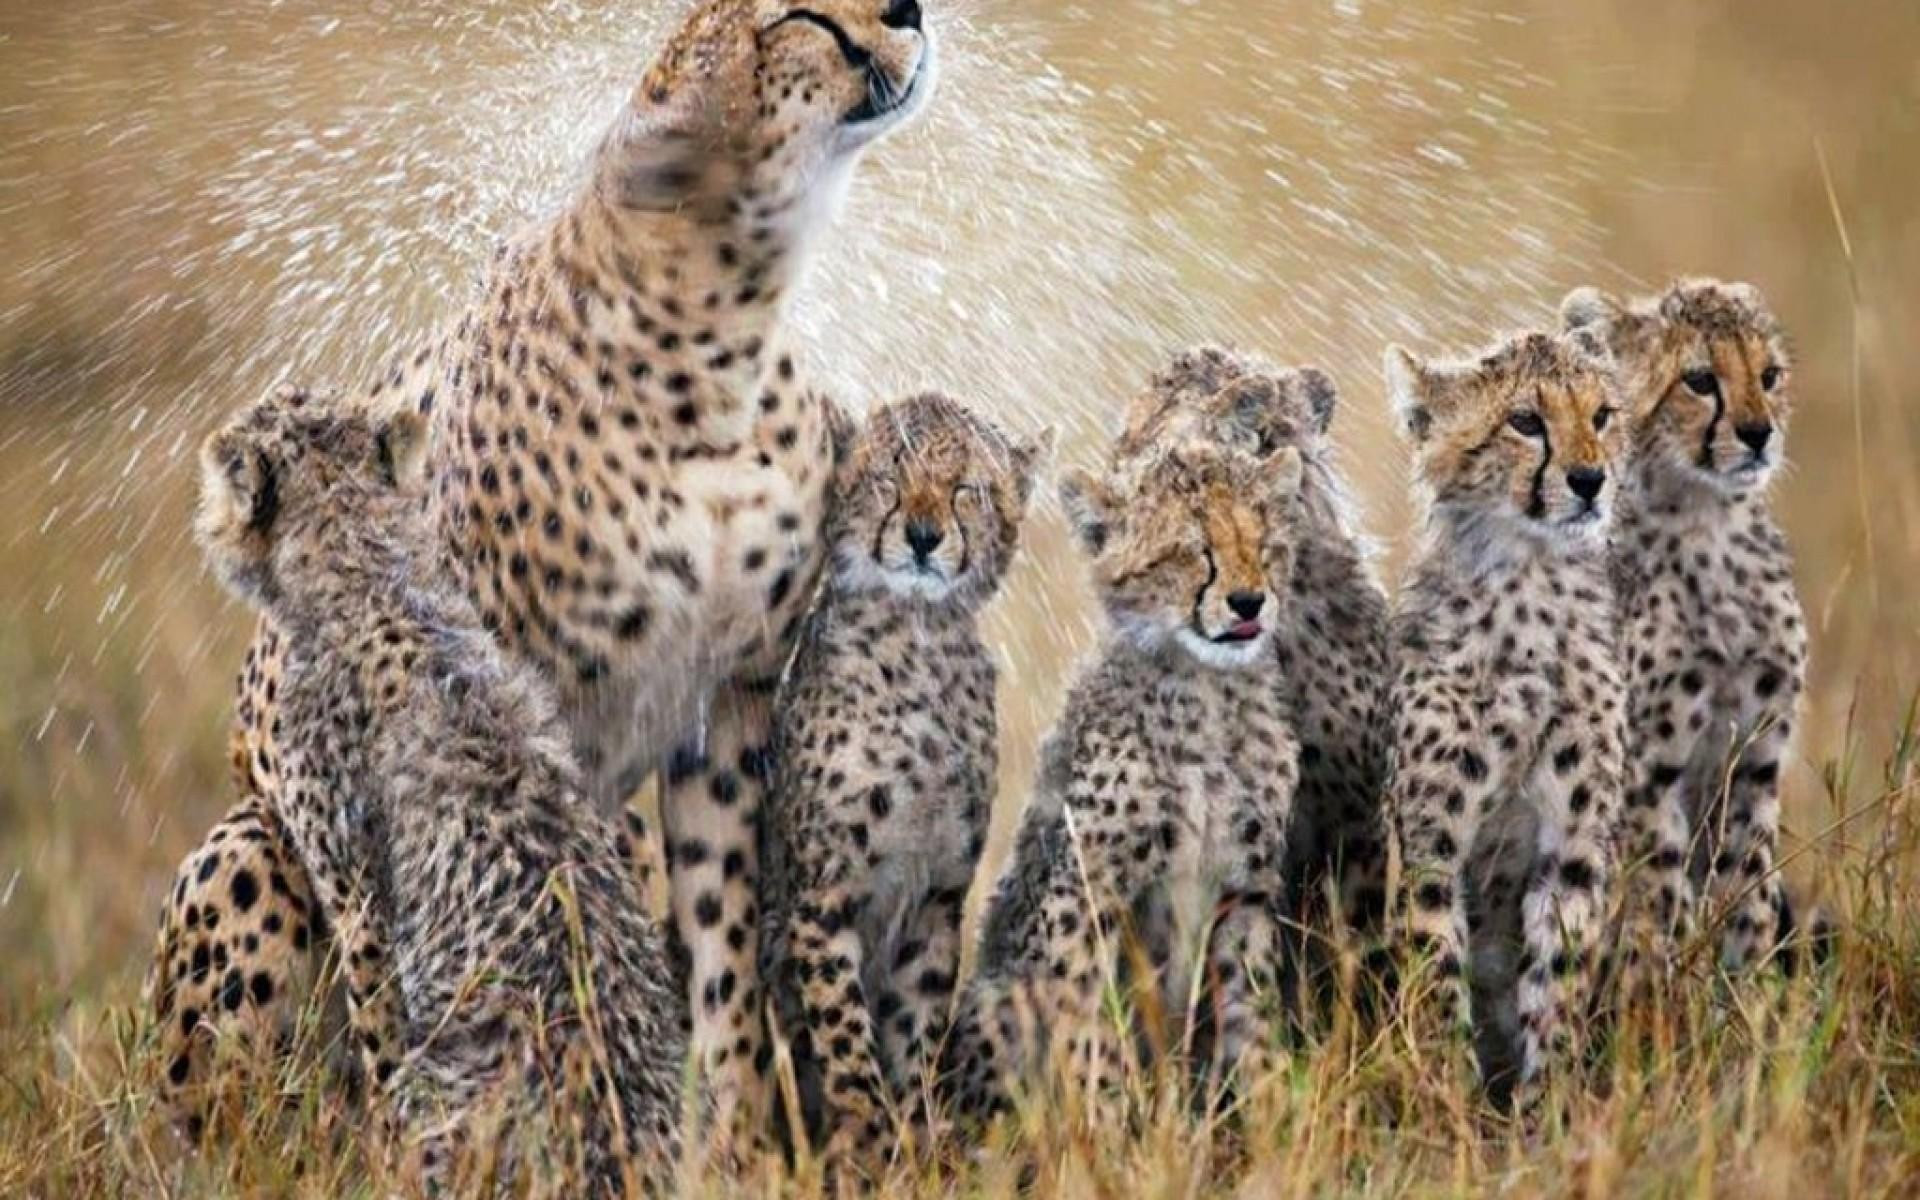 Baby Cheetah Wallpaper High Quality - Wickedsa com